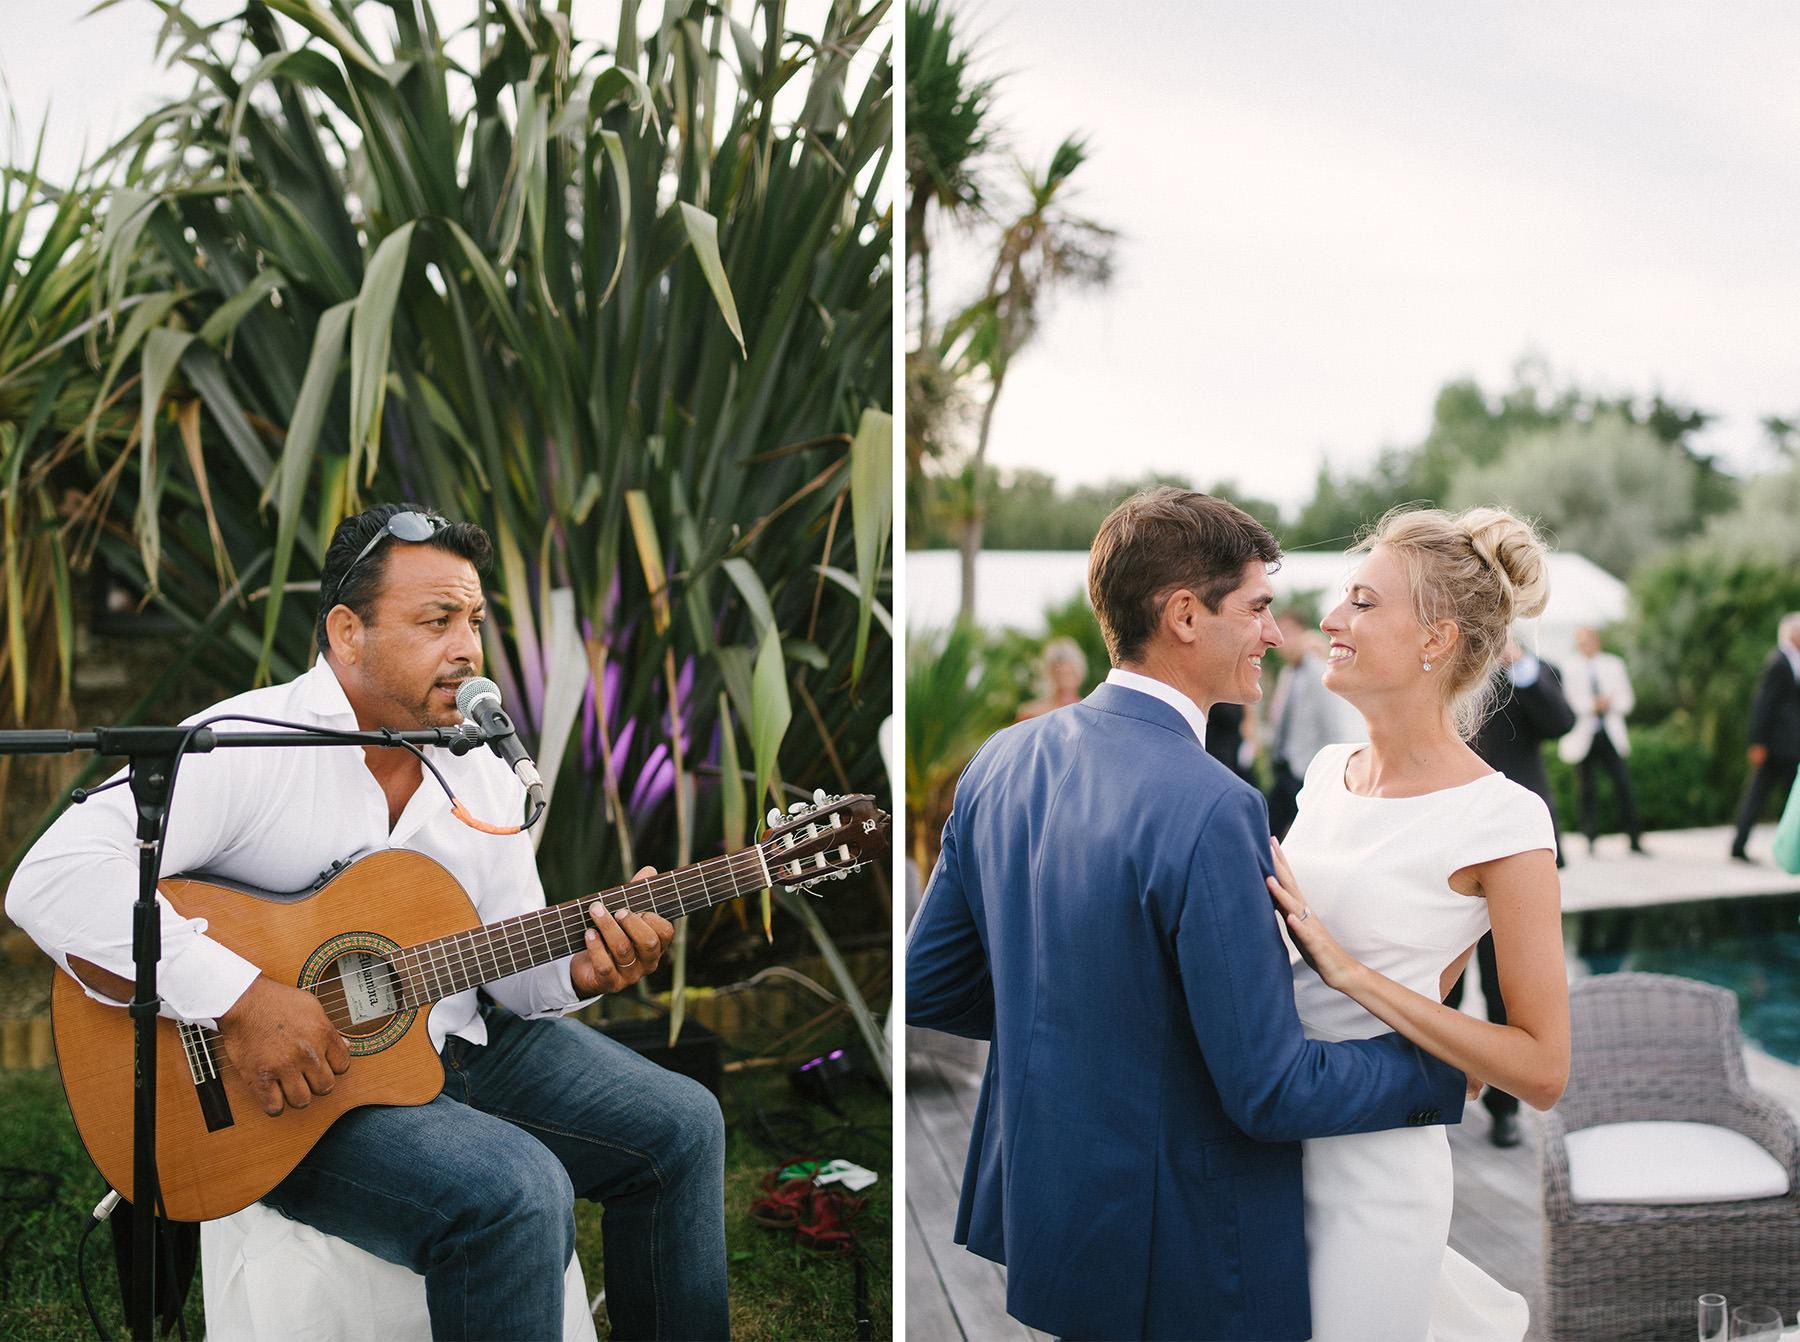 photographe-mariage-ile-d-yeu-00067